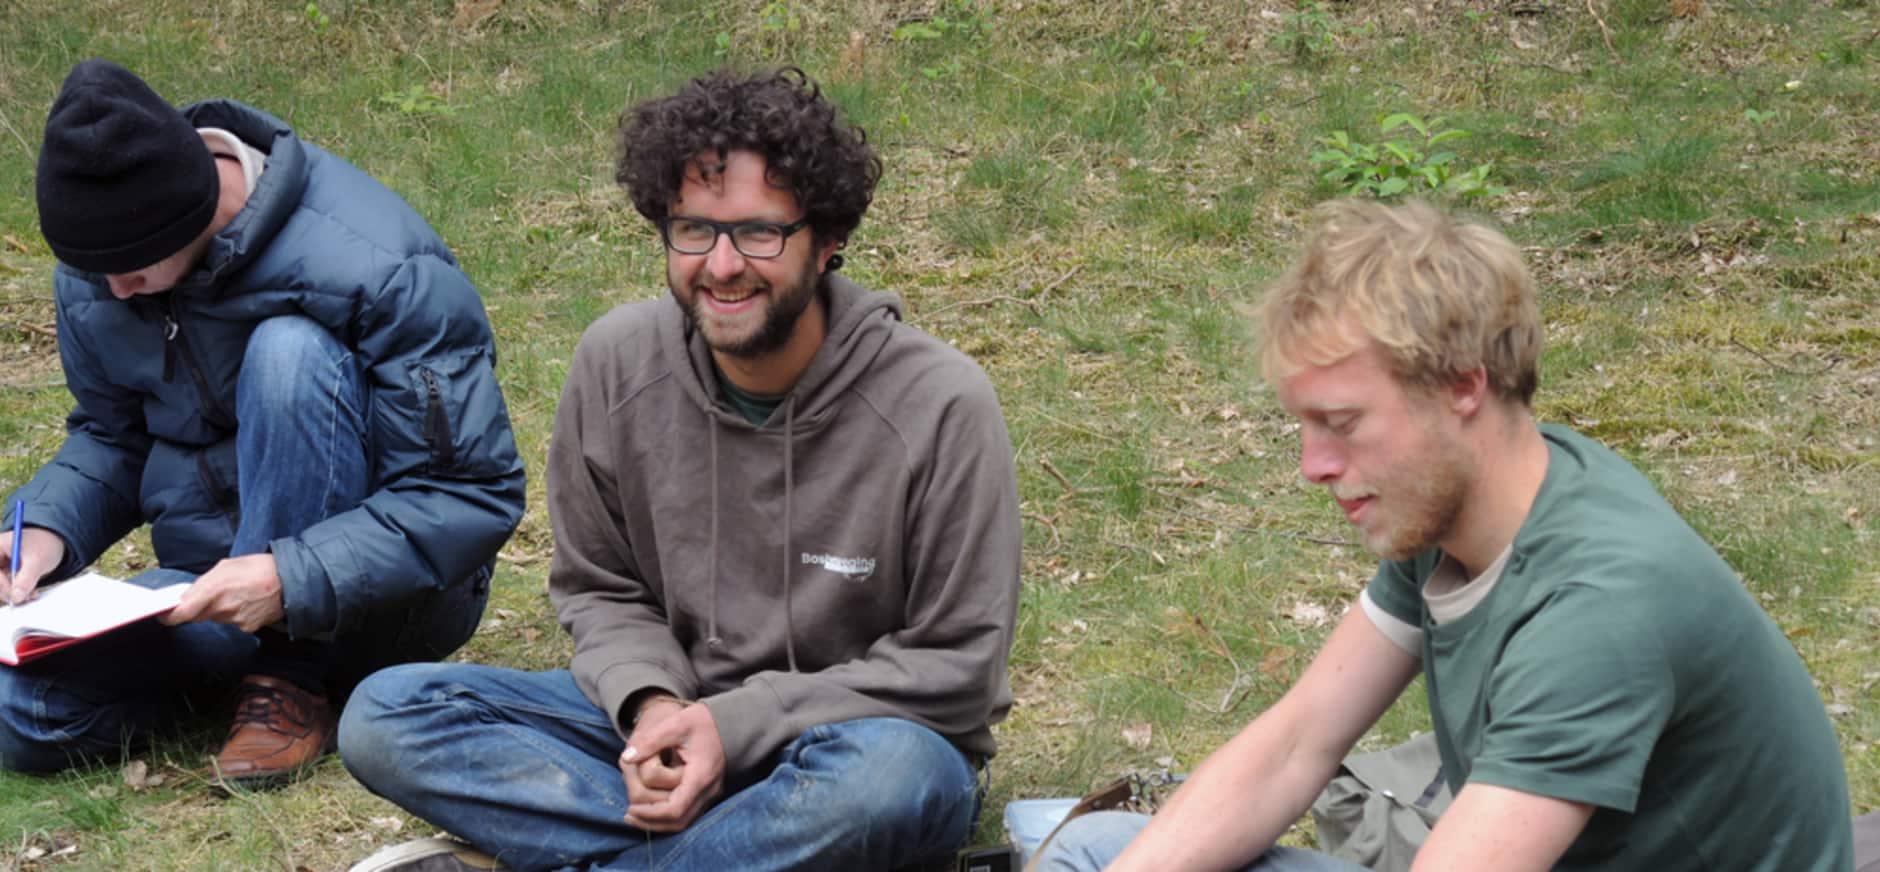 Leer overleven in het Leuvenumse bos - survivalweekend